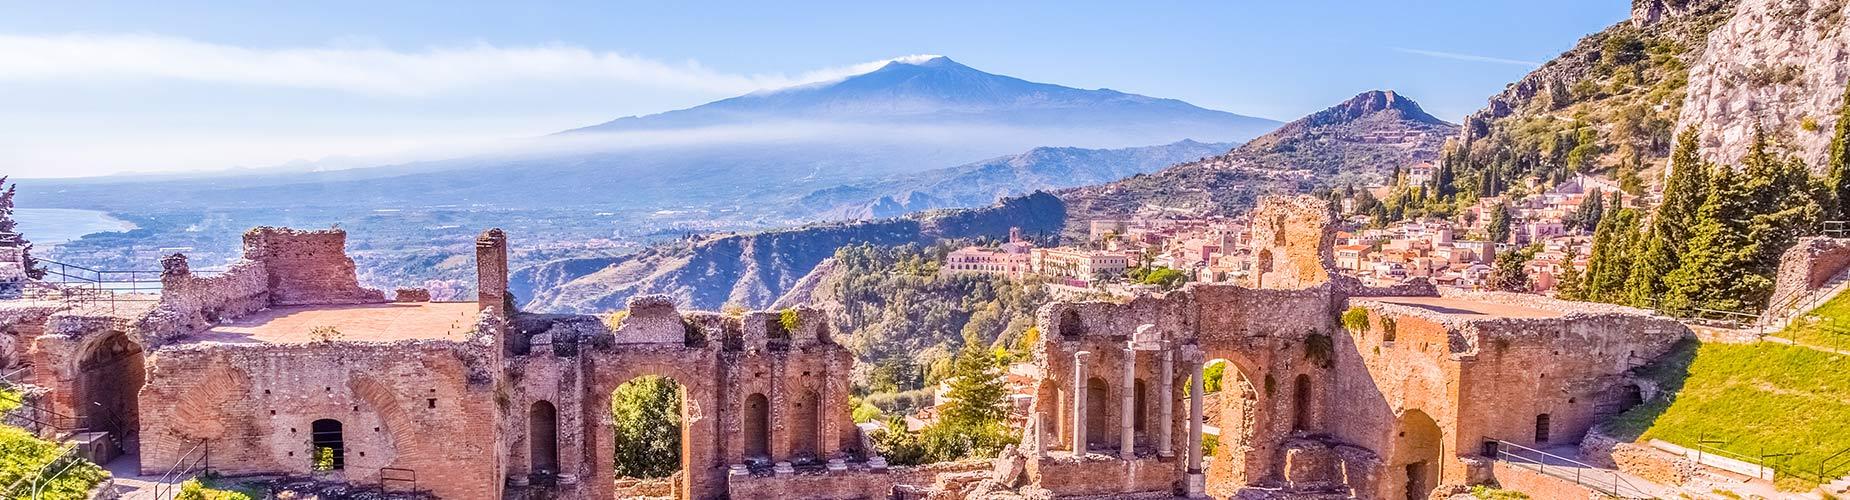 Sizilien – Von den Alpen zum Vulkan